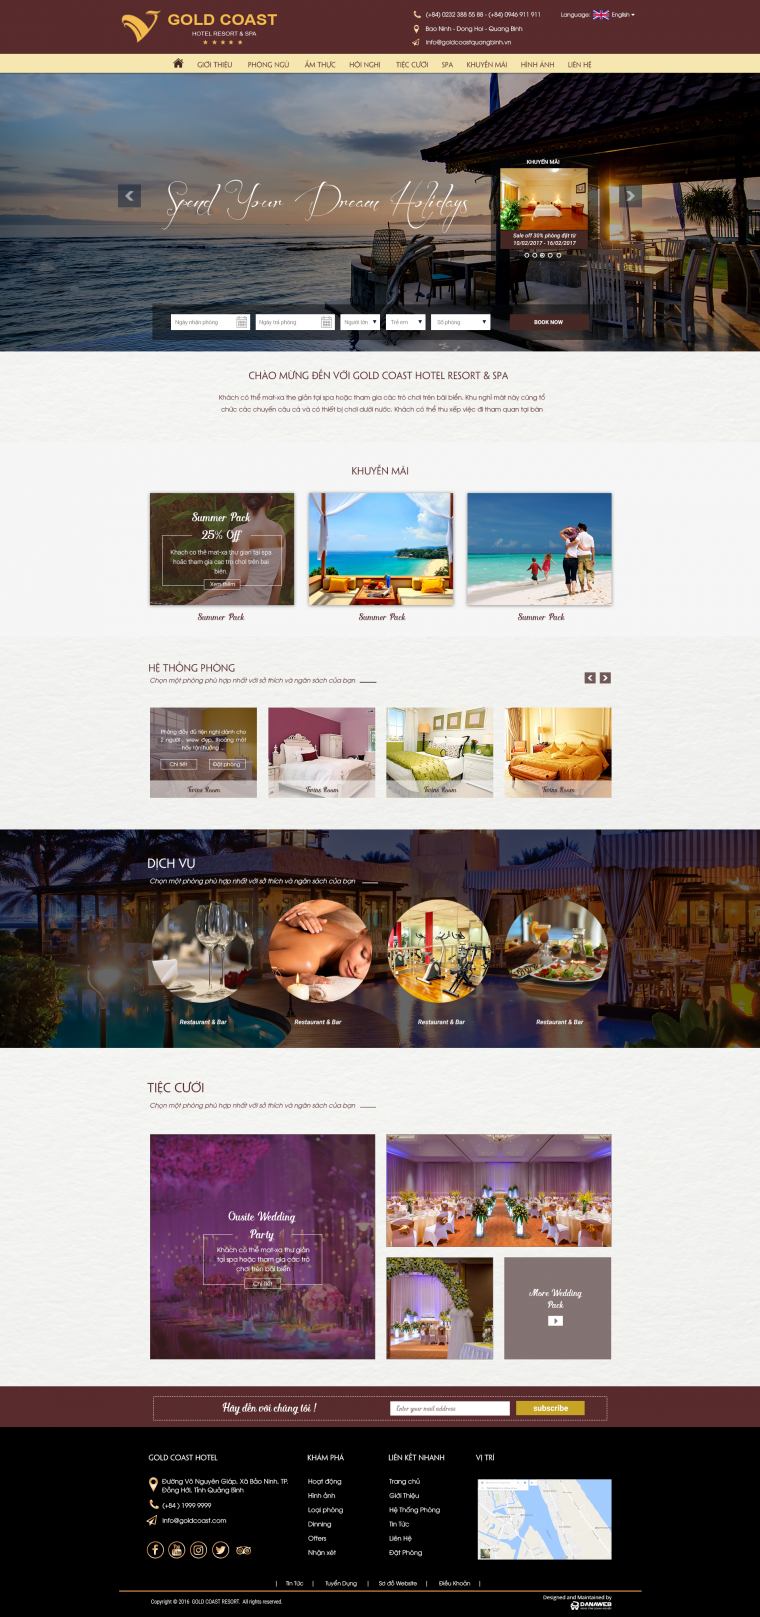 Resort GoldCoast Quang Binh